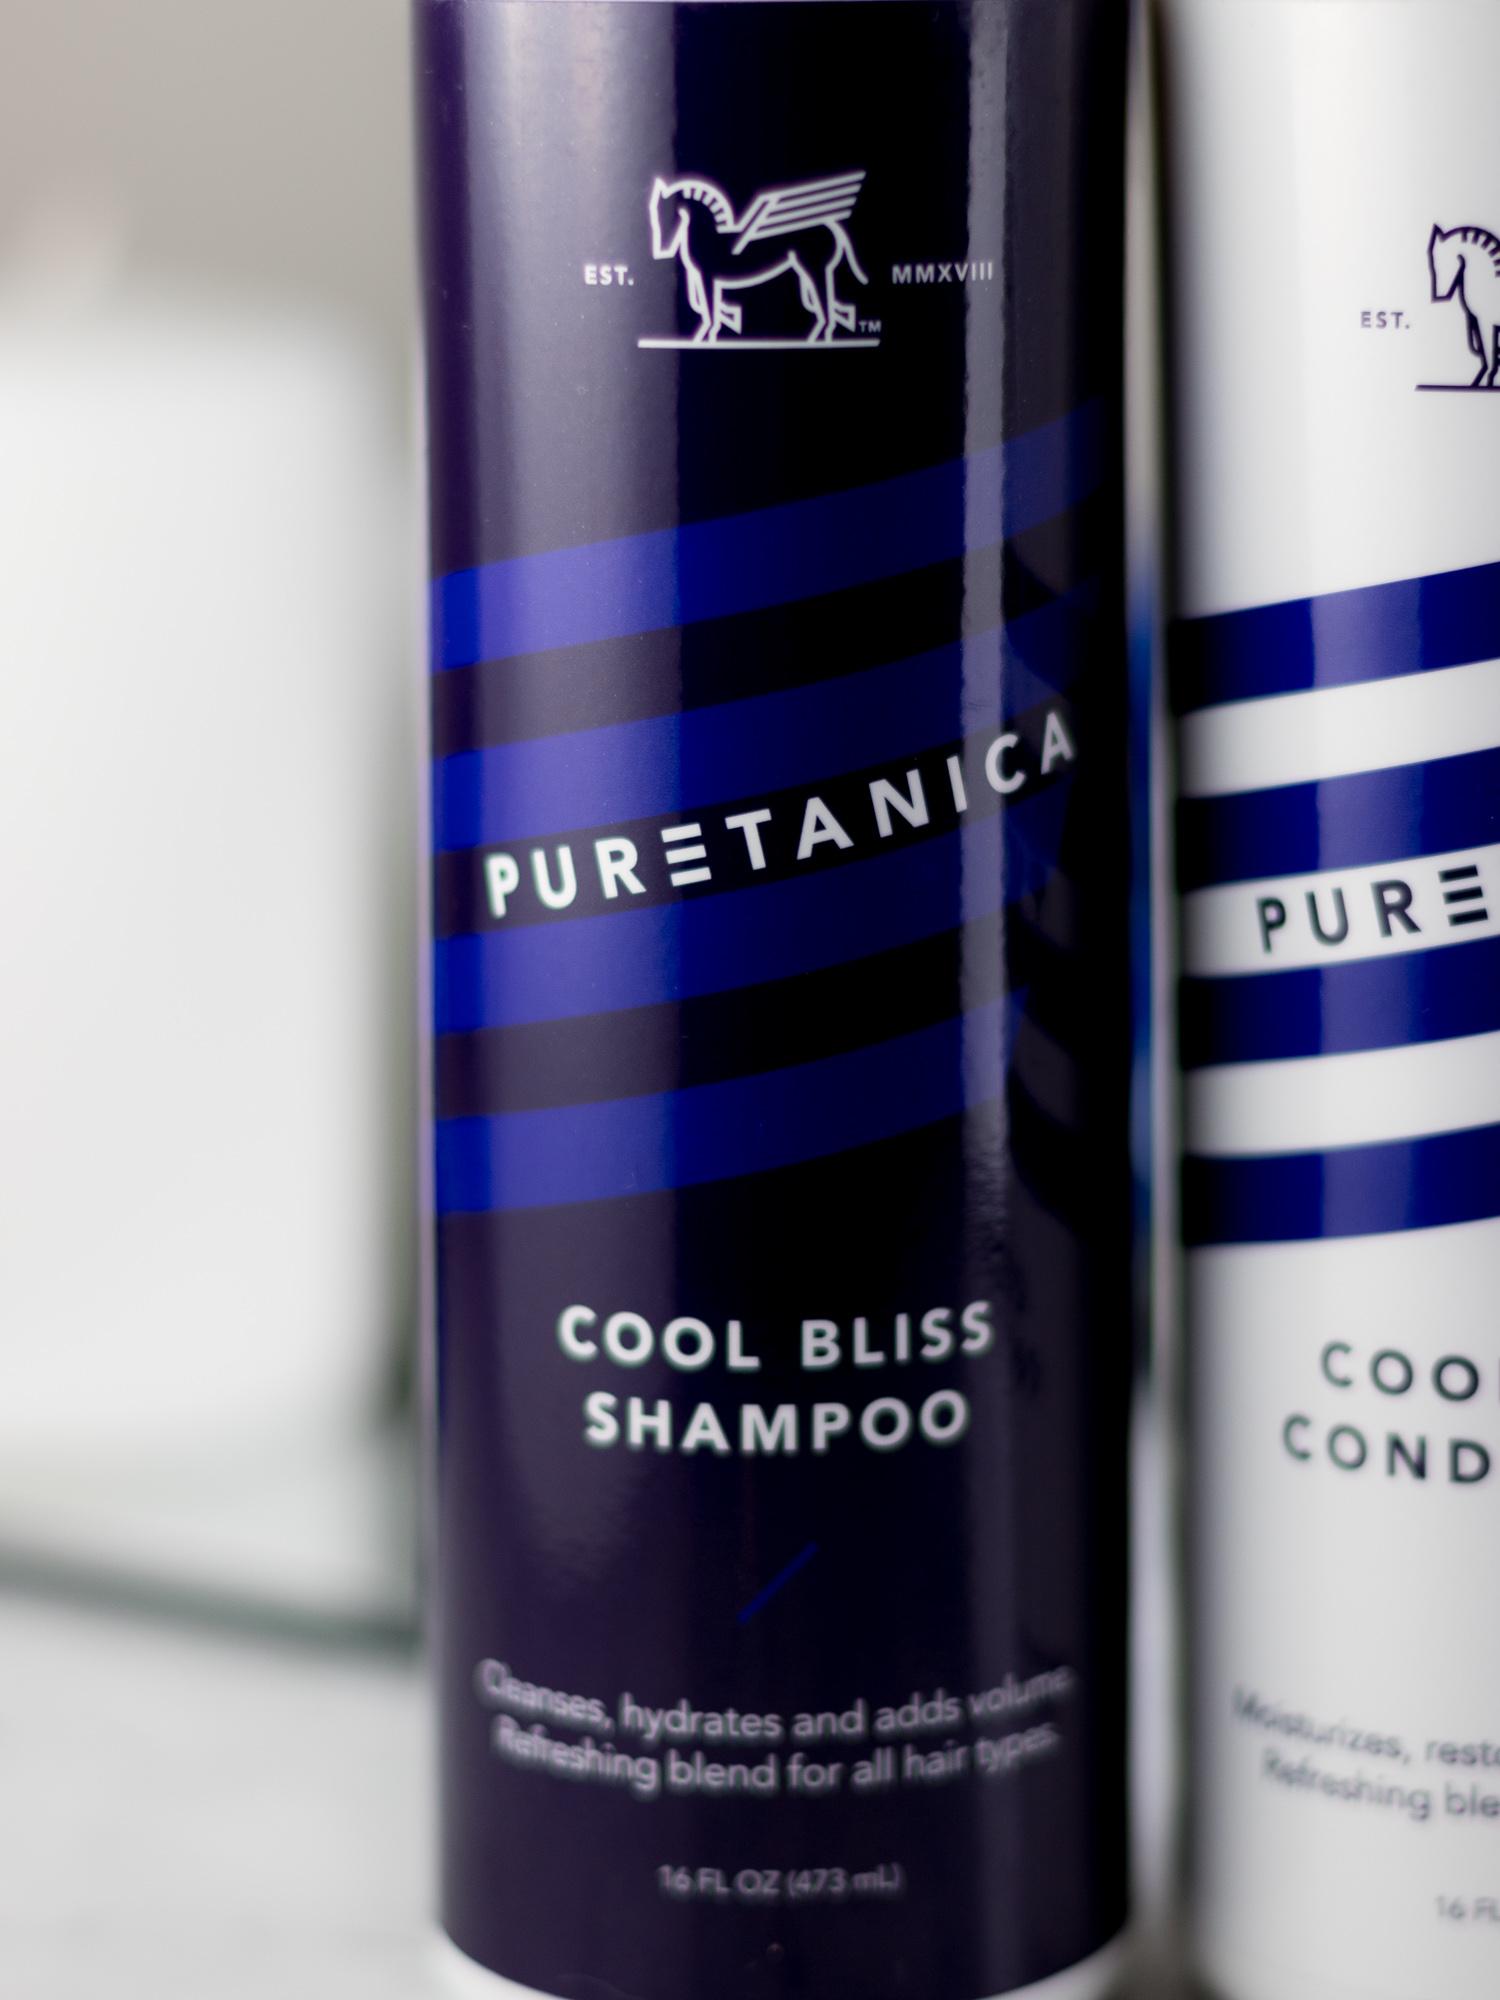 Puretanica Cool Bliss Shampoo